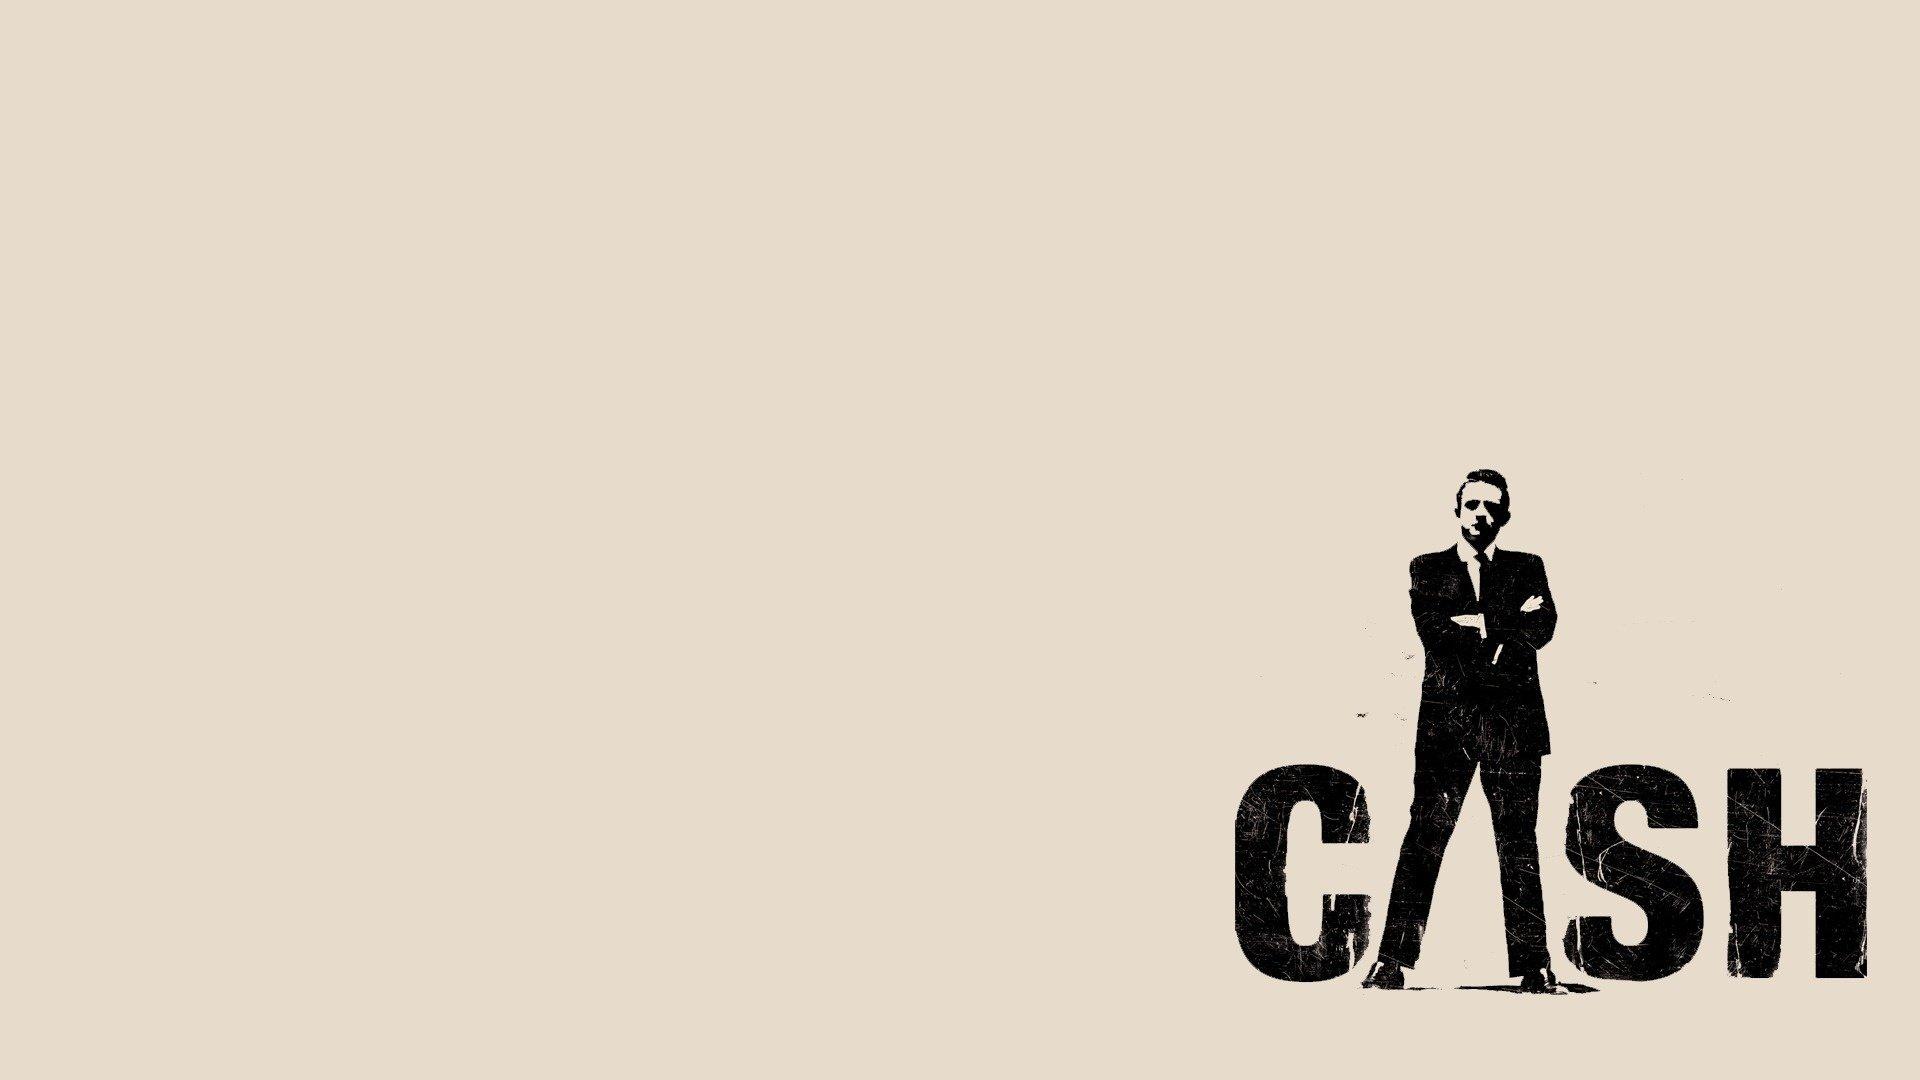 Johnny cash country music minimal wallpaper 1920x1080 - Cash wallpaper ...